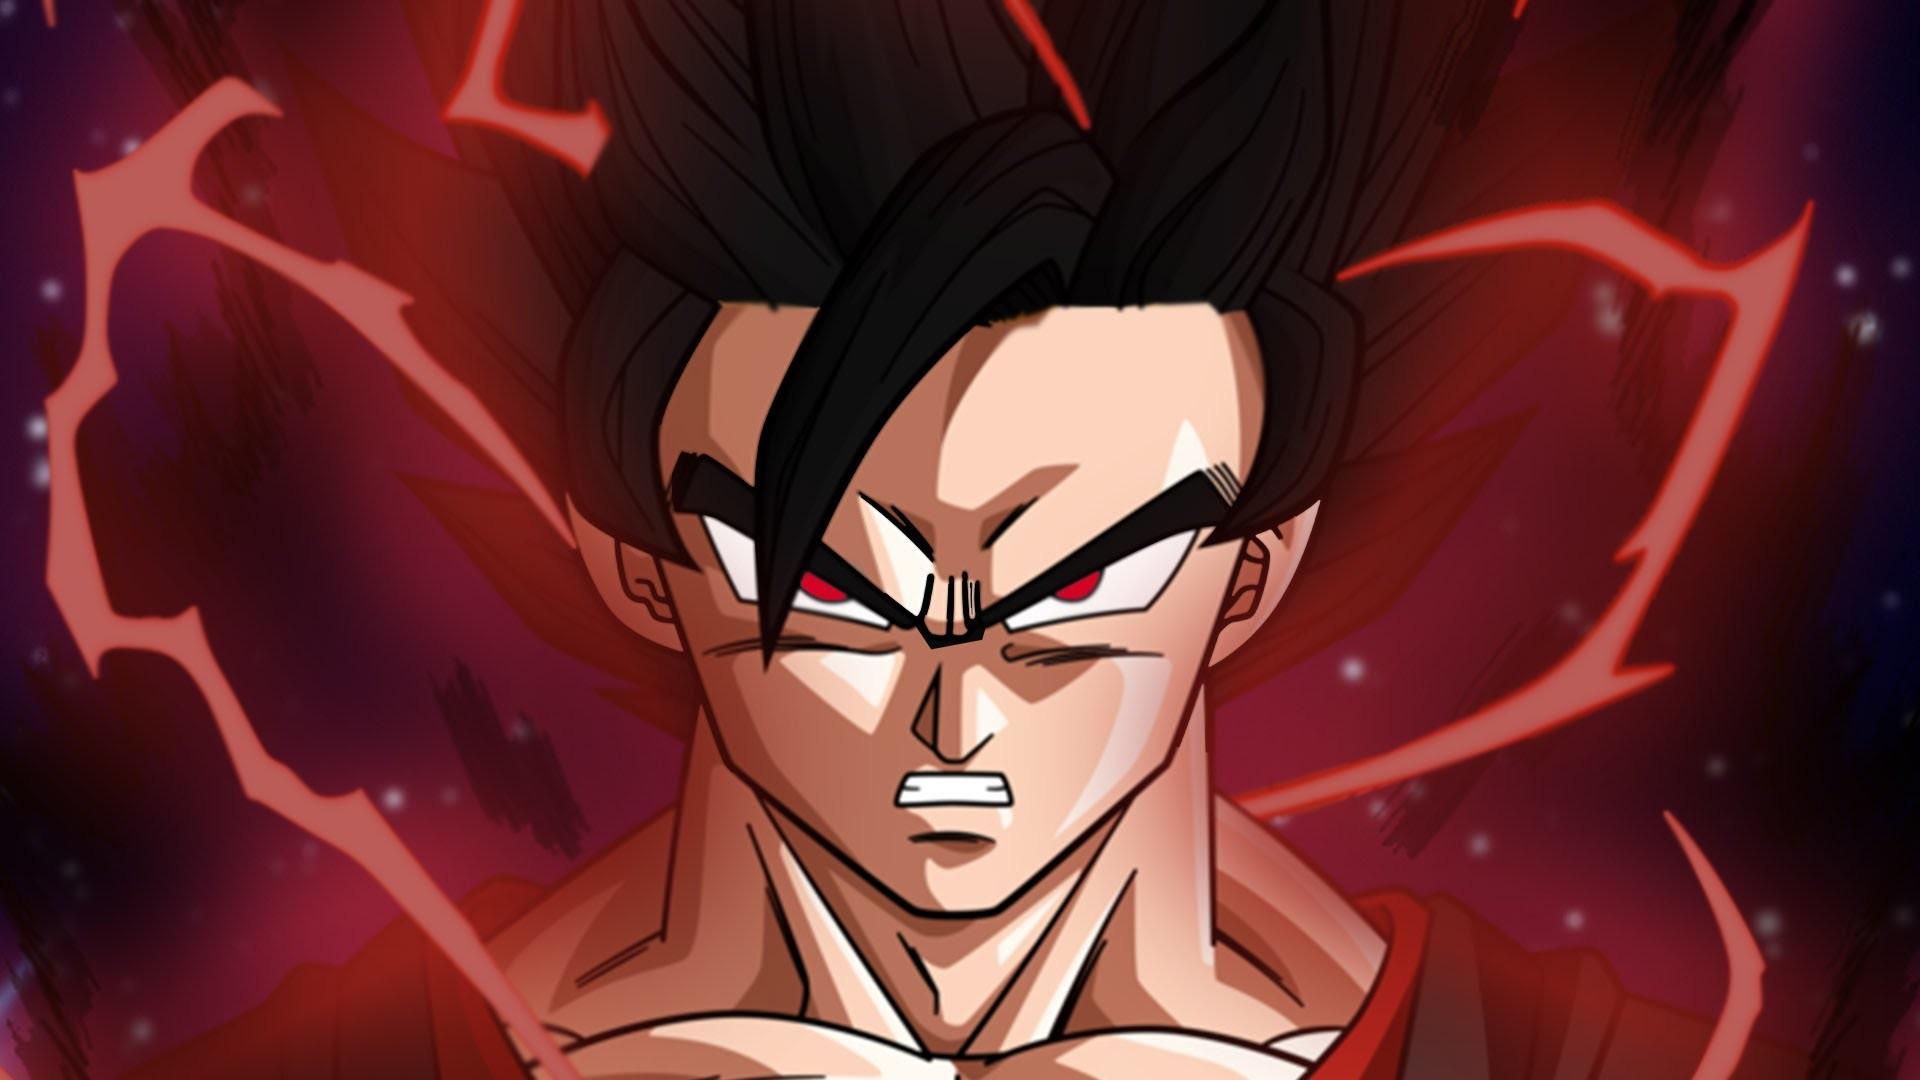 Dark Goku Dragon Ball Super Wallpaper